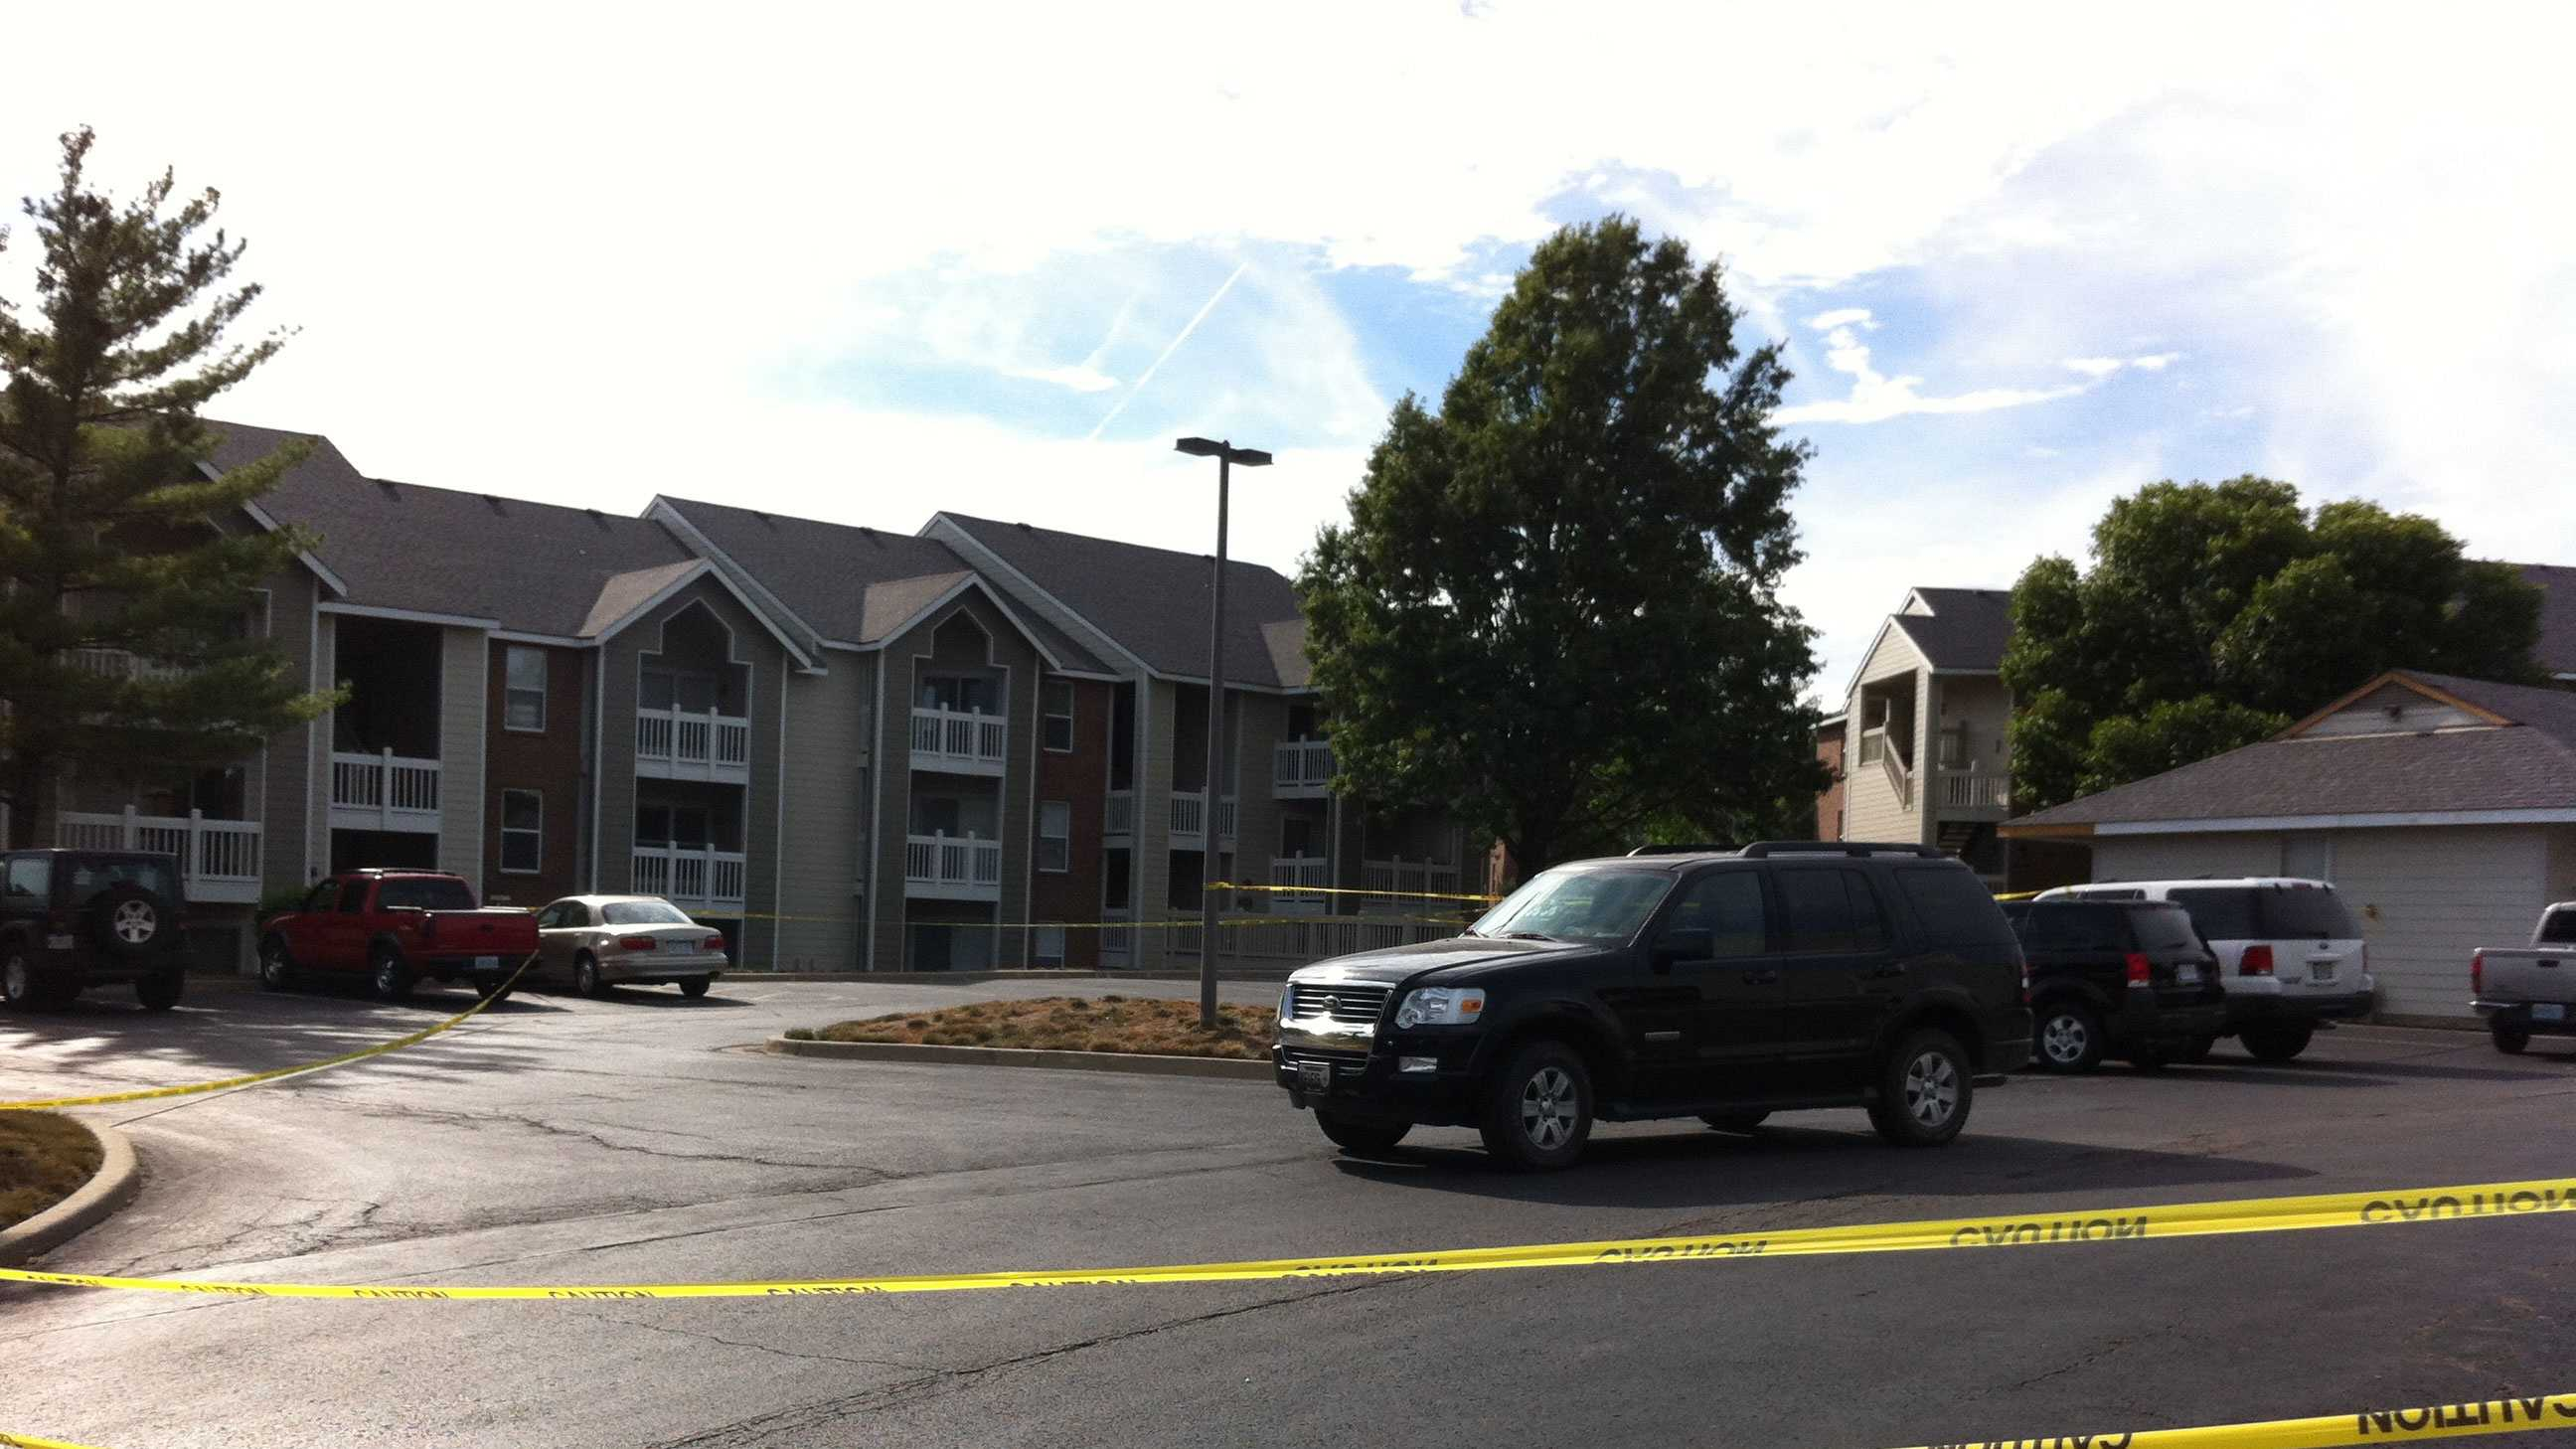 Northland fatal shooting image 2